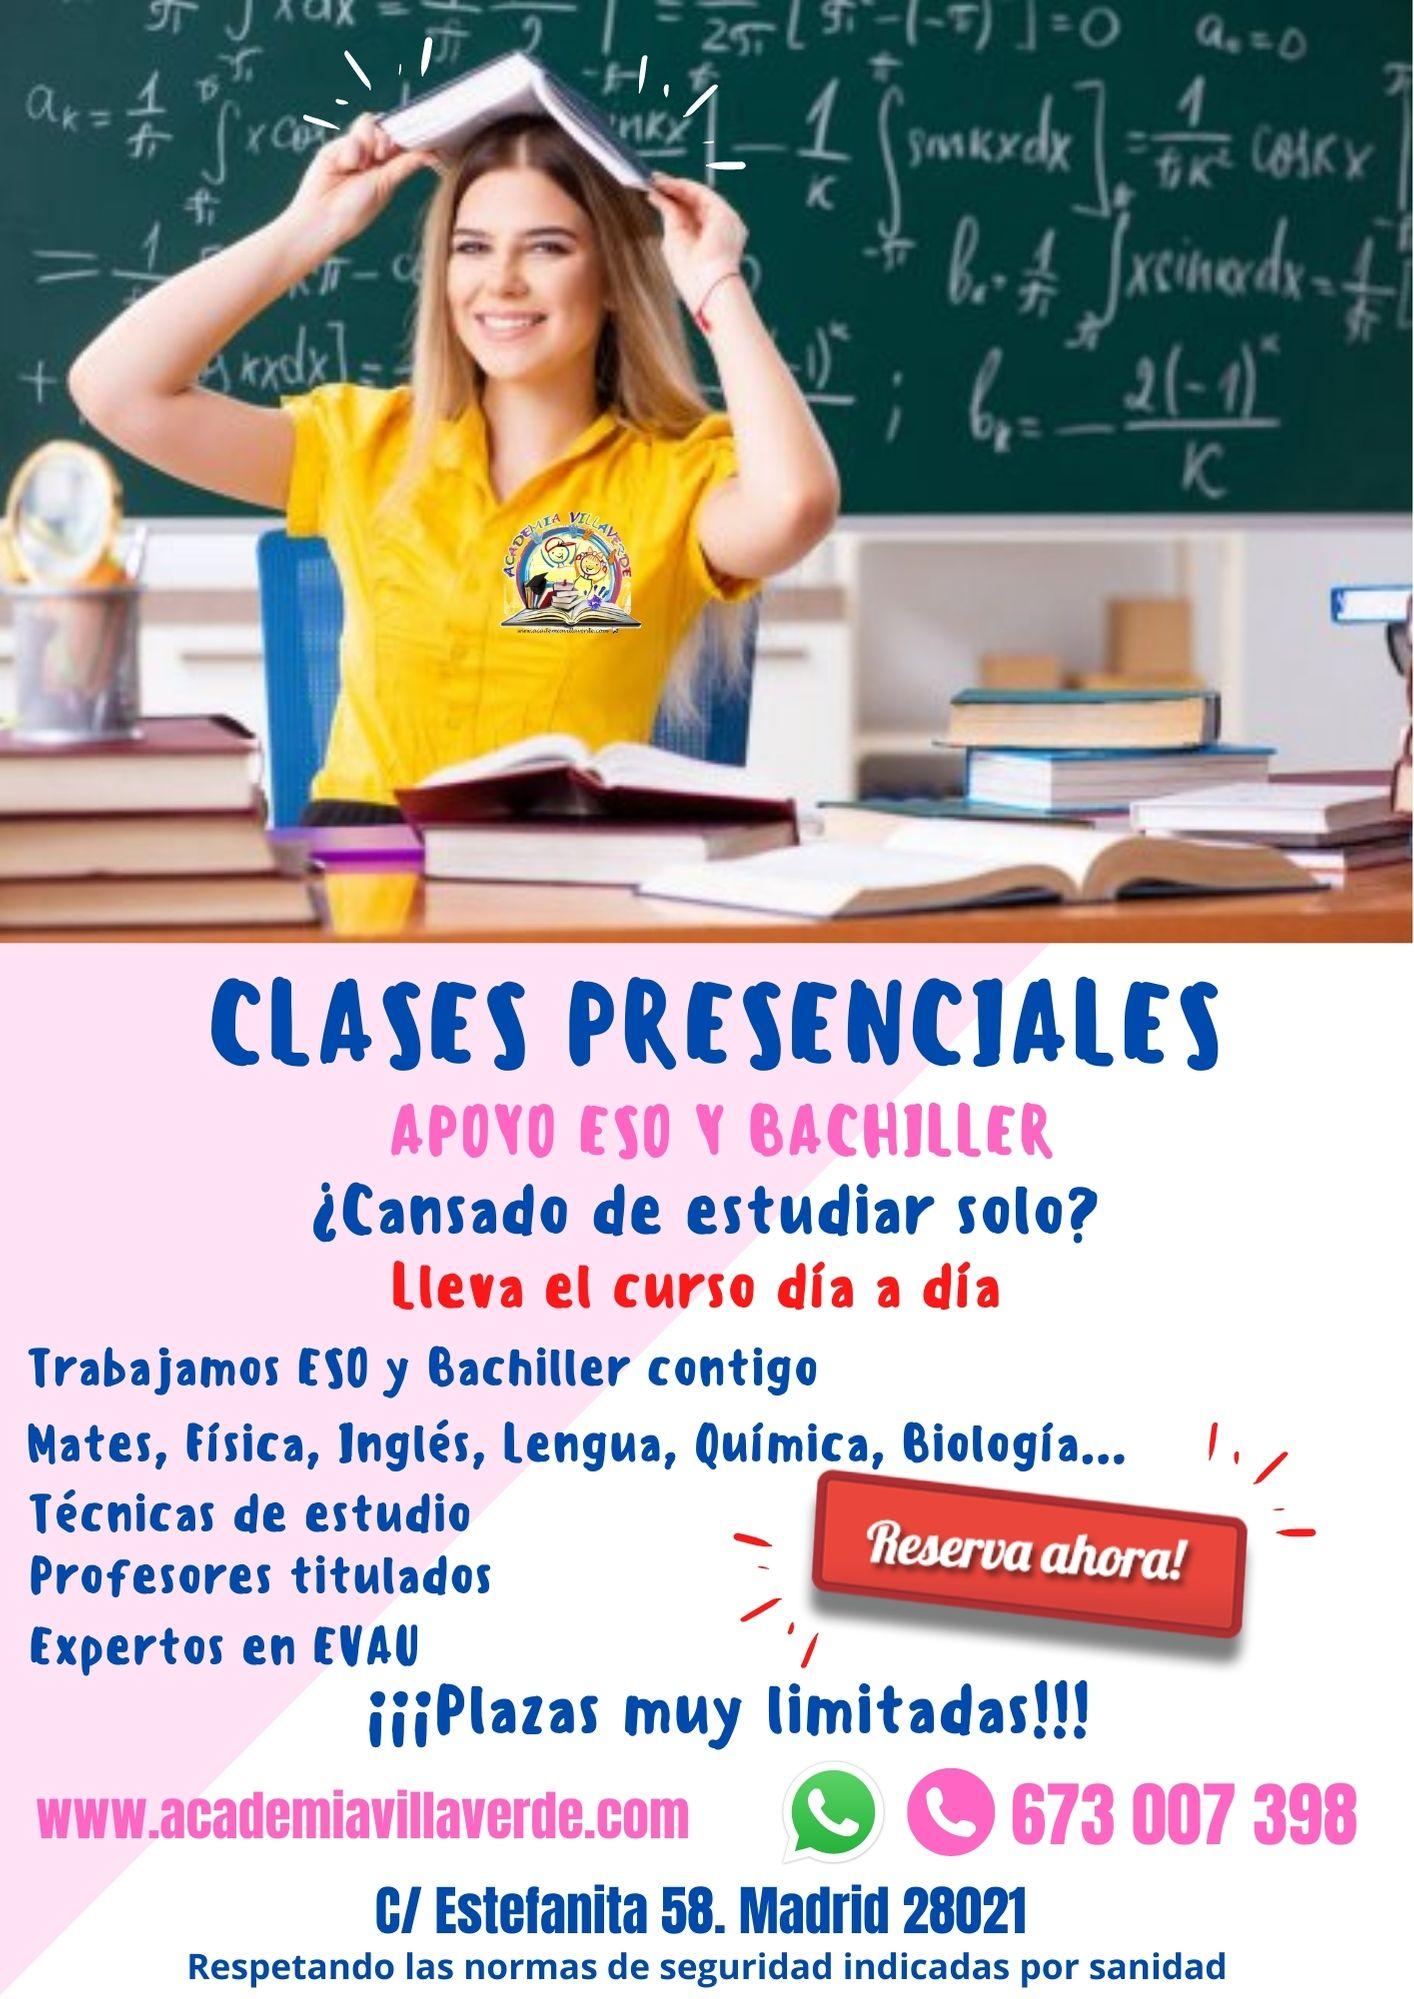 presencial-academia-villaverde-eso-bach-2020